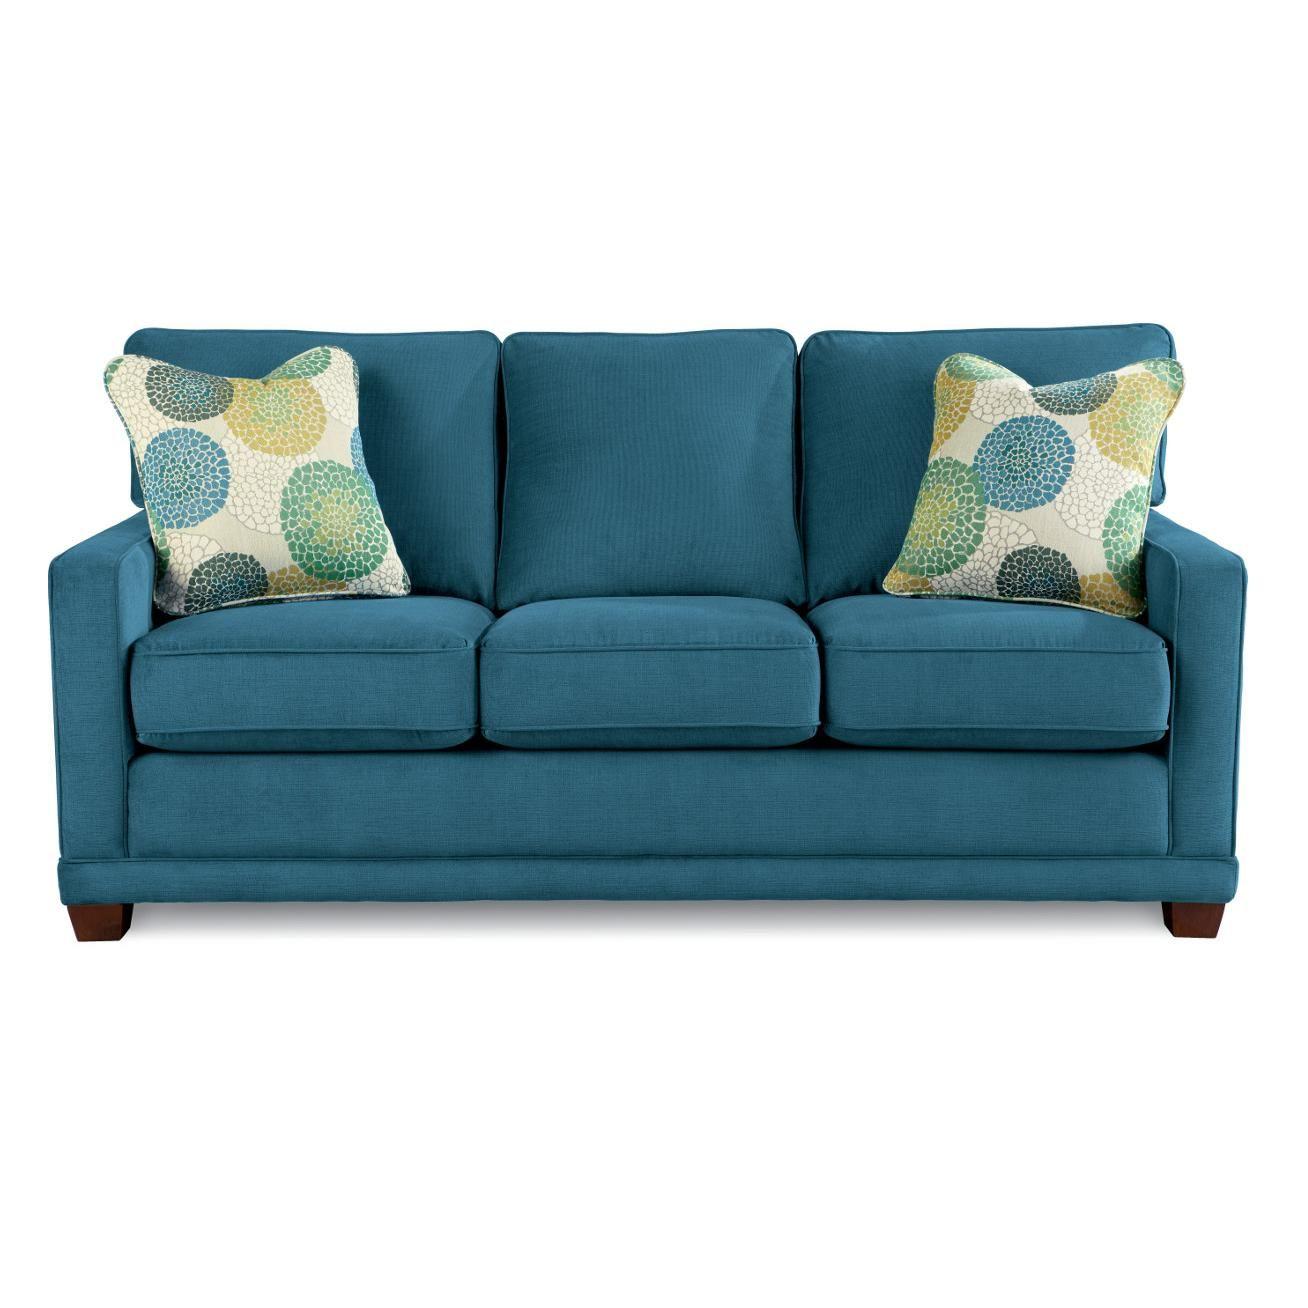 Kennedy Supreme Comfort Queen Sleep Sofa By La Z Boy Sofa Transitional Sofas Furniture